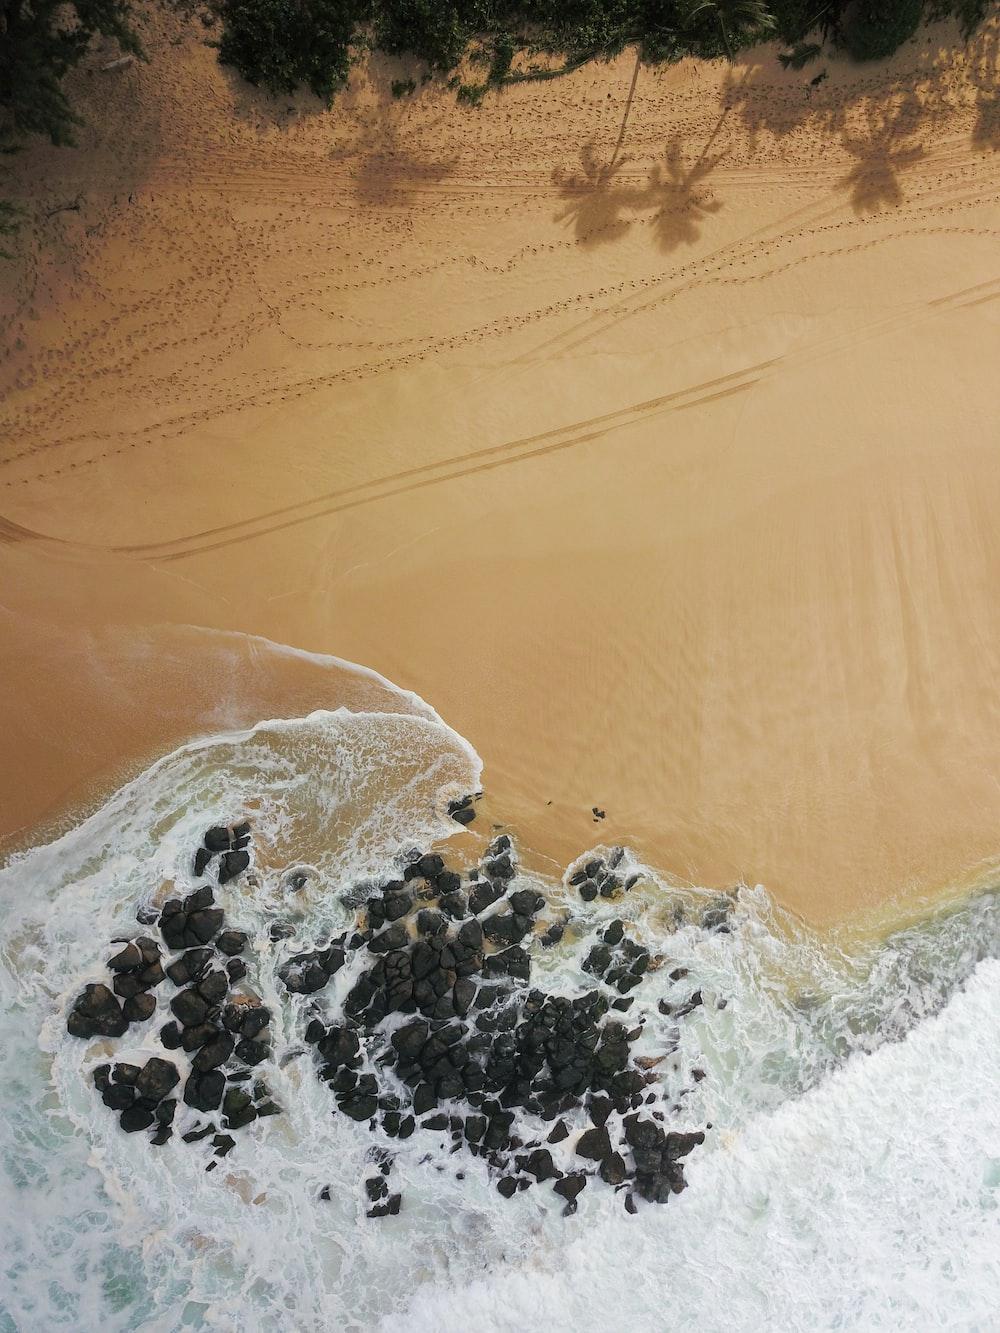 water hitting rocks on shore near trees during daytime